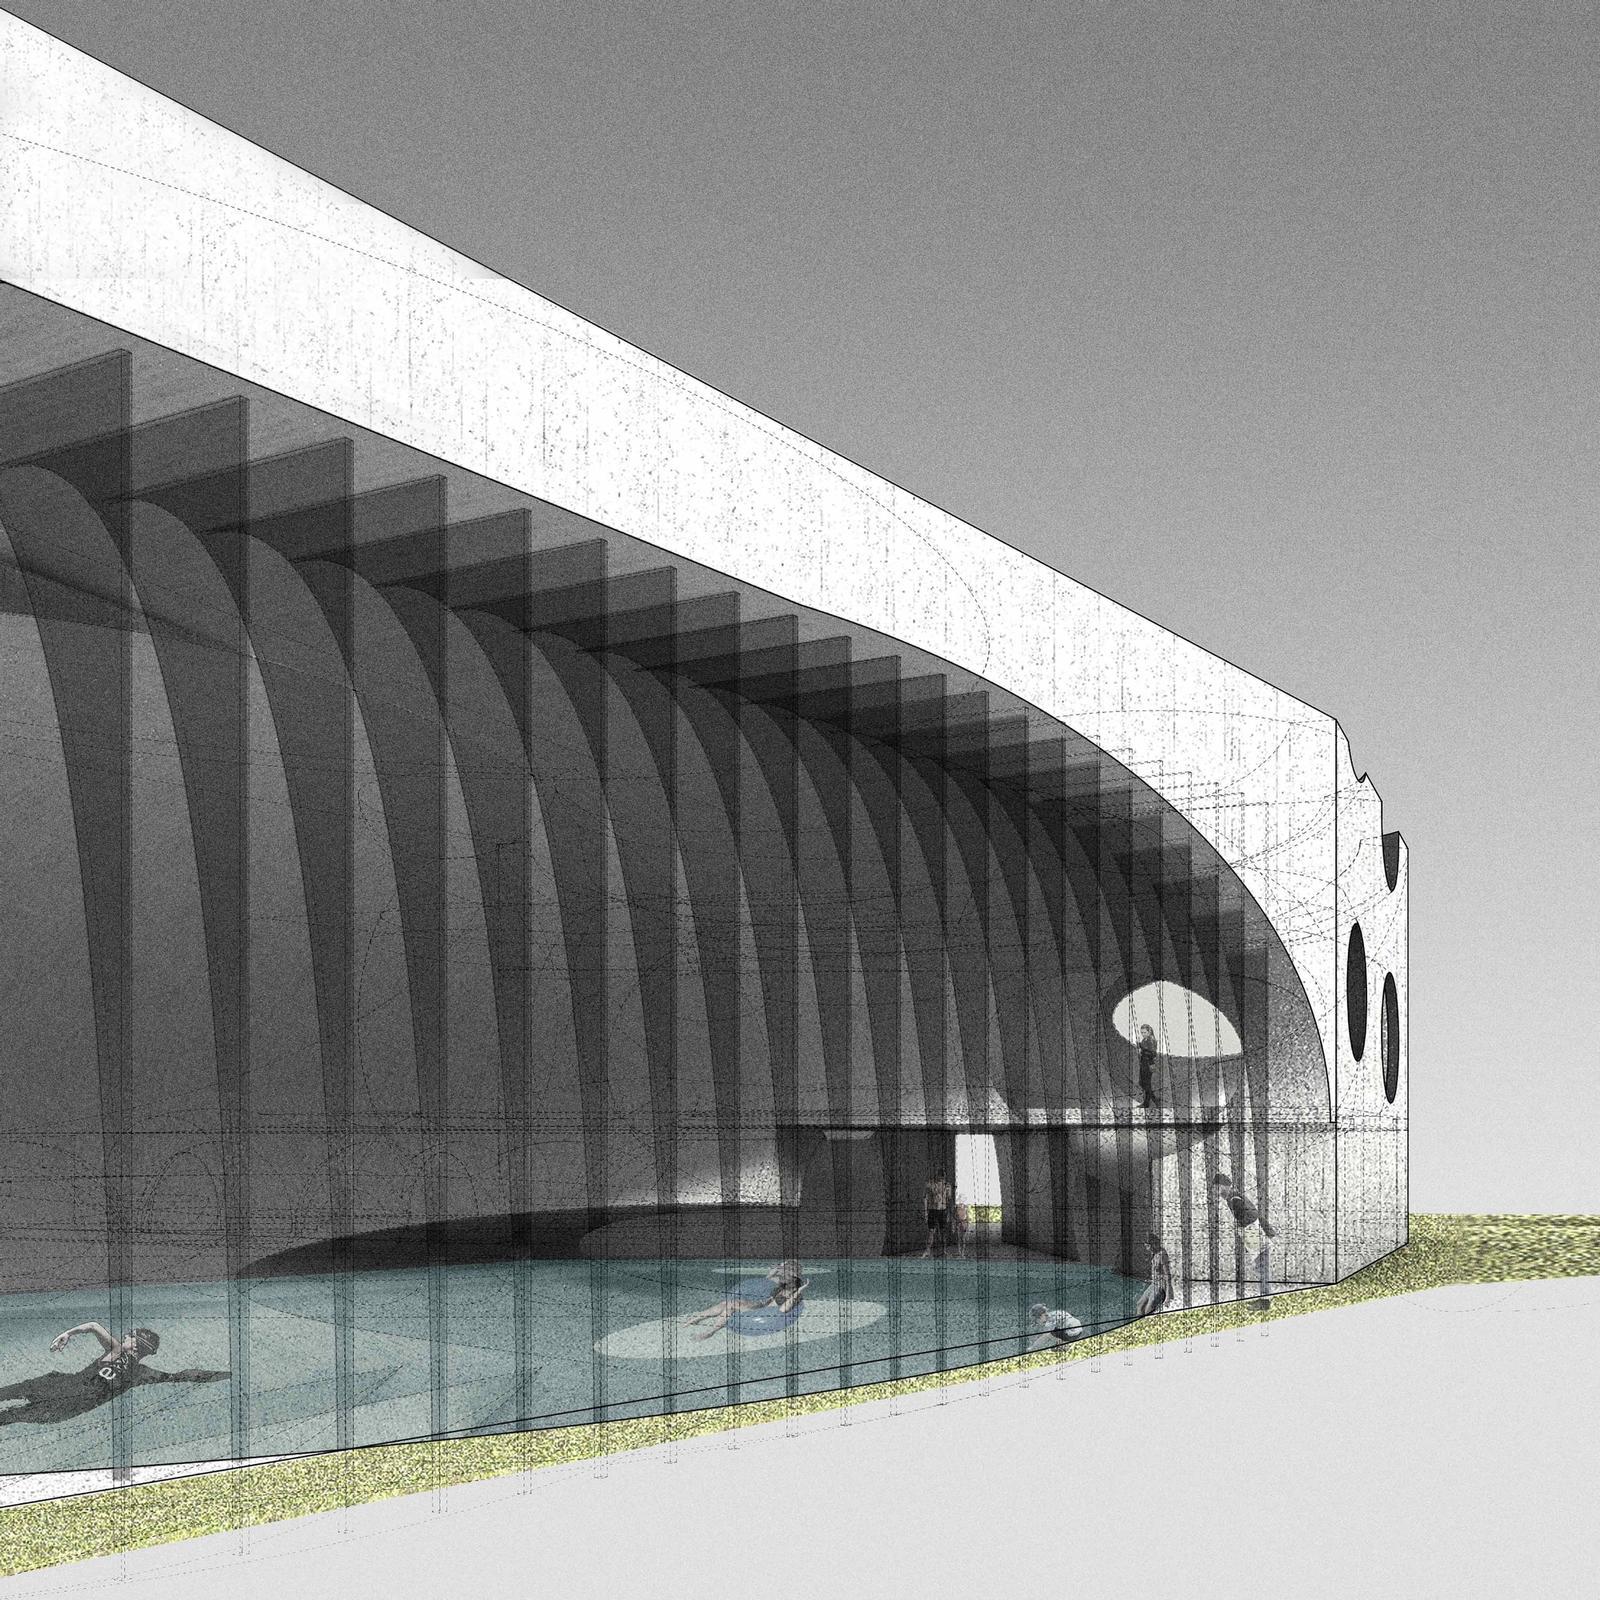 Design for a Natatorium Water Park in San Francisco